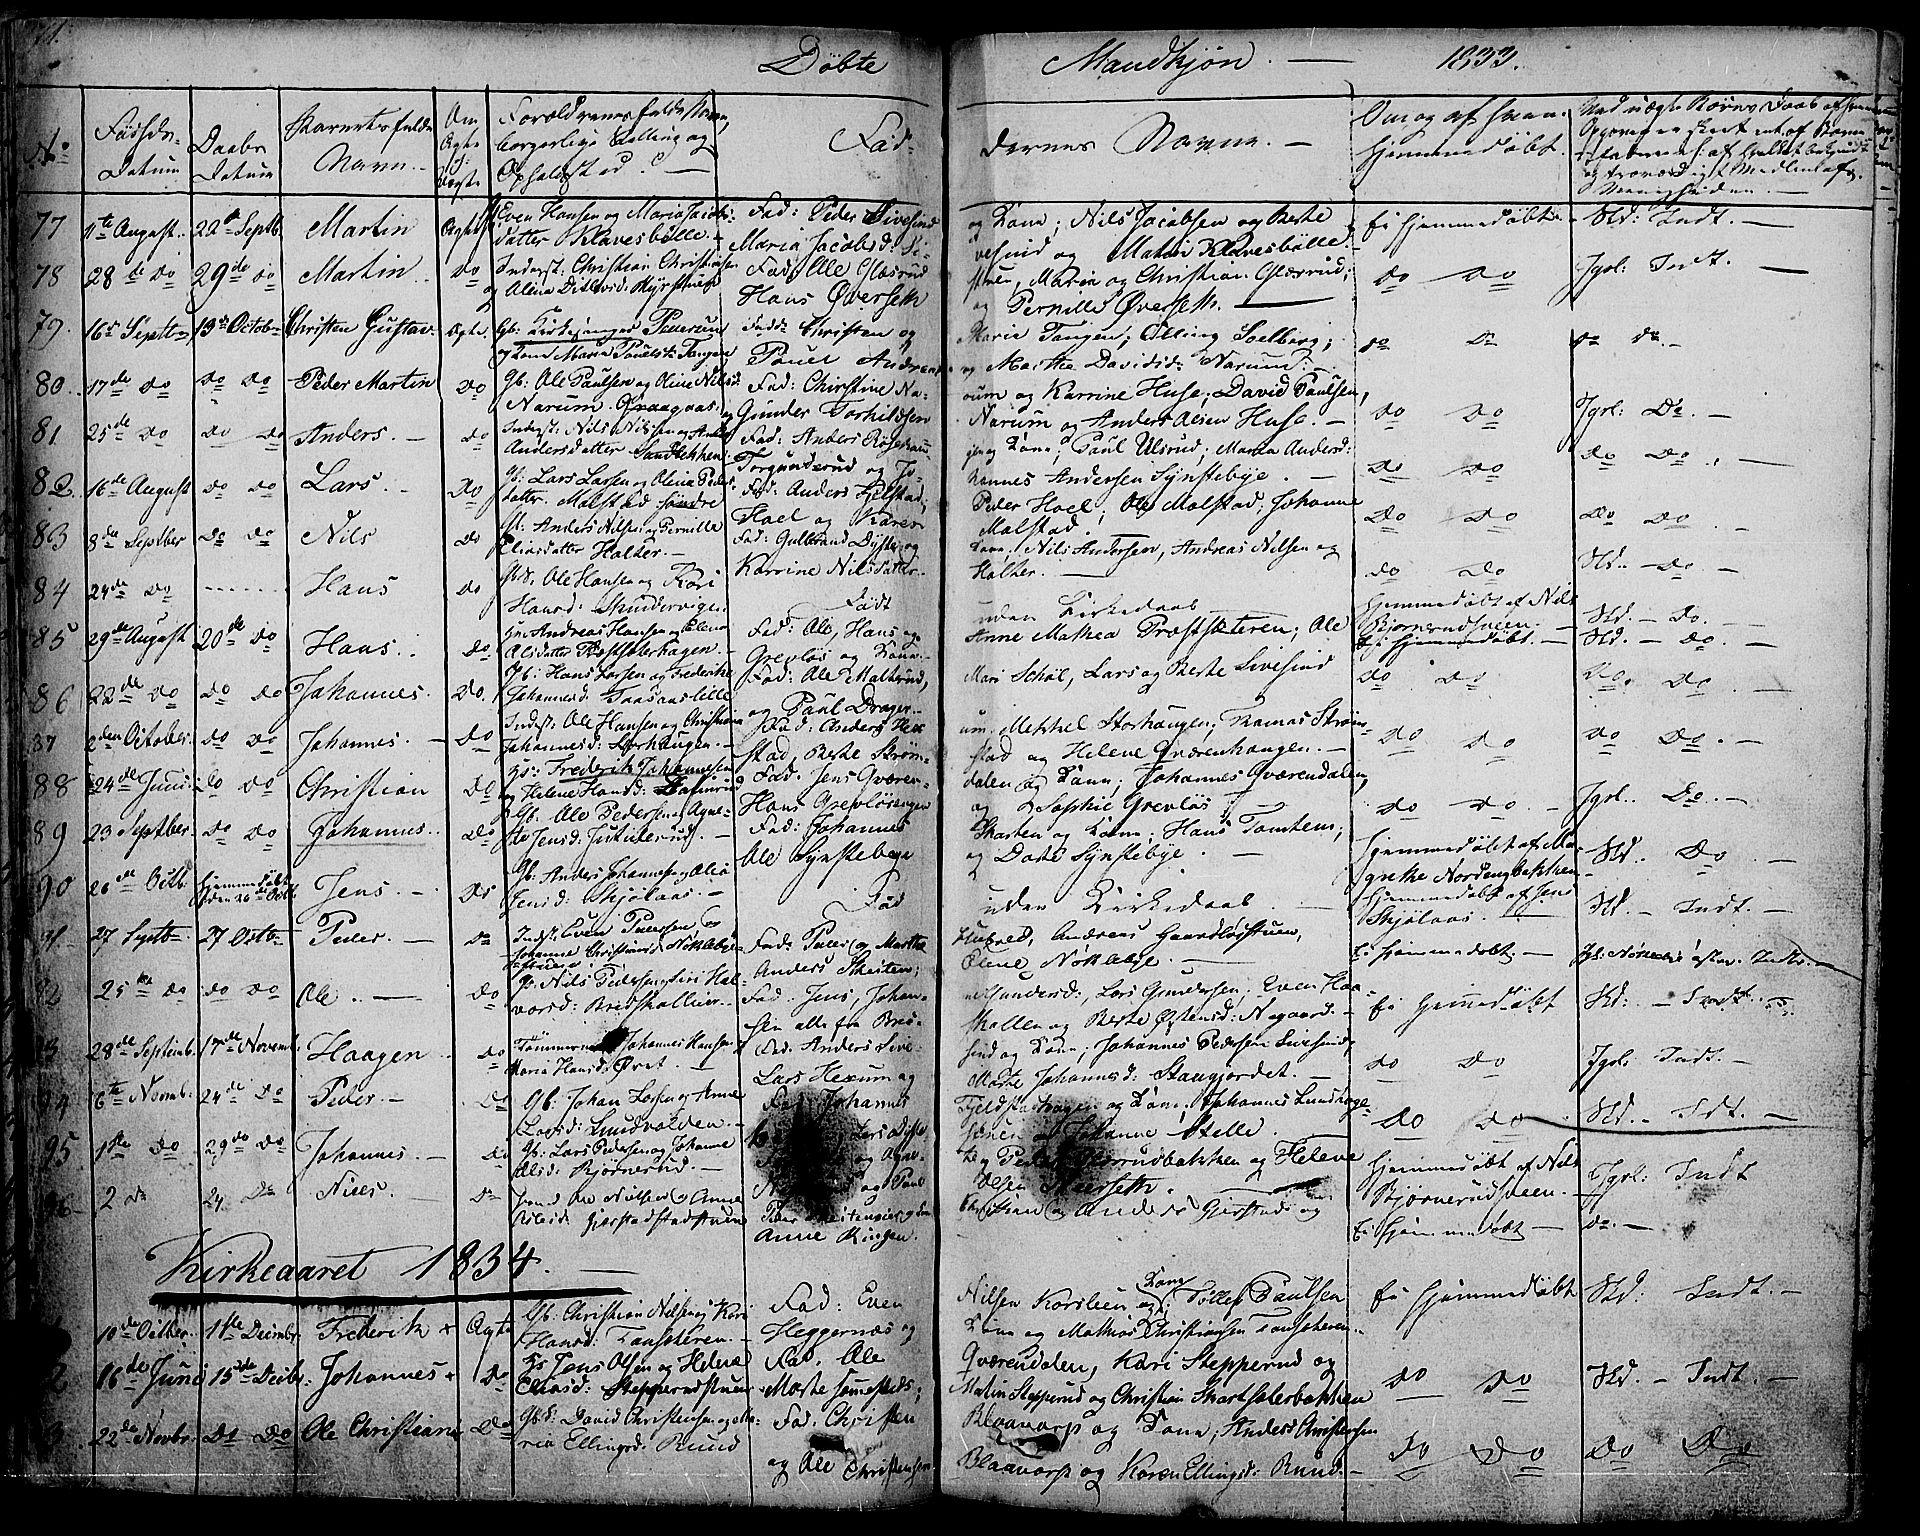 SAH, Vestre Toten prestekontor, H/Ha/Haa/L0002: Ministerialbok nr. 2, 1825-1837, s. 71